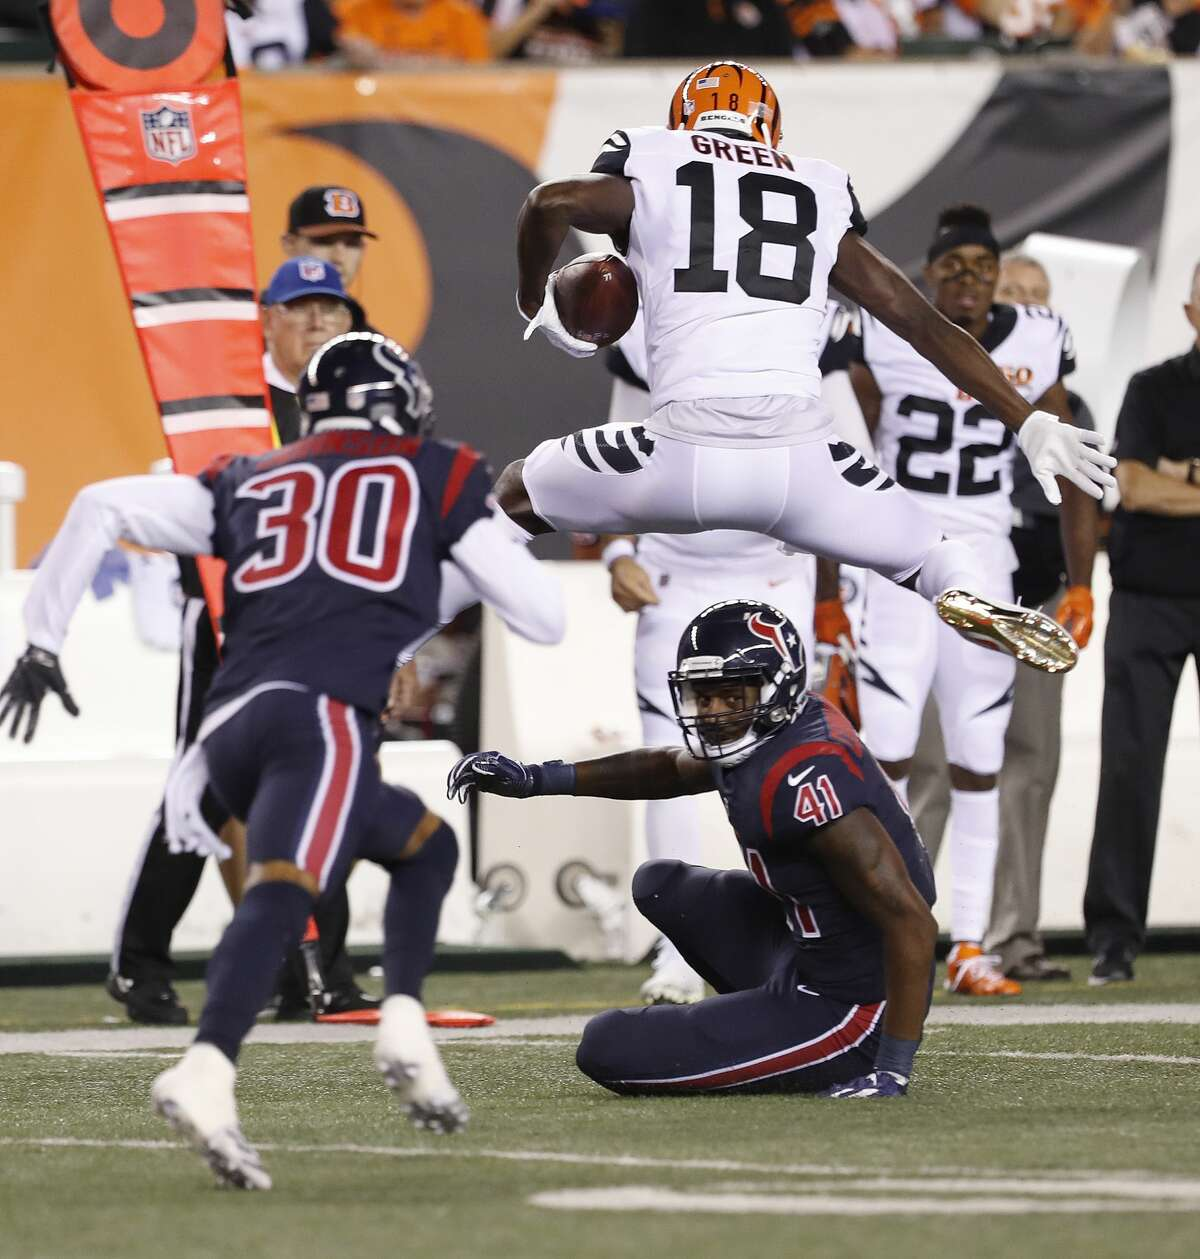 Cincinnati Bengals wide receiver A.J. Green (18) jumps over Houston Texans linebacker Zach Cunningham (41) during the first quarter of an NFL football game at Paul Brown Stadium on Thursday, Sept. 14, 2017, in Cincinnati. ( Brett Coomer / Houston Chronicle )